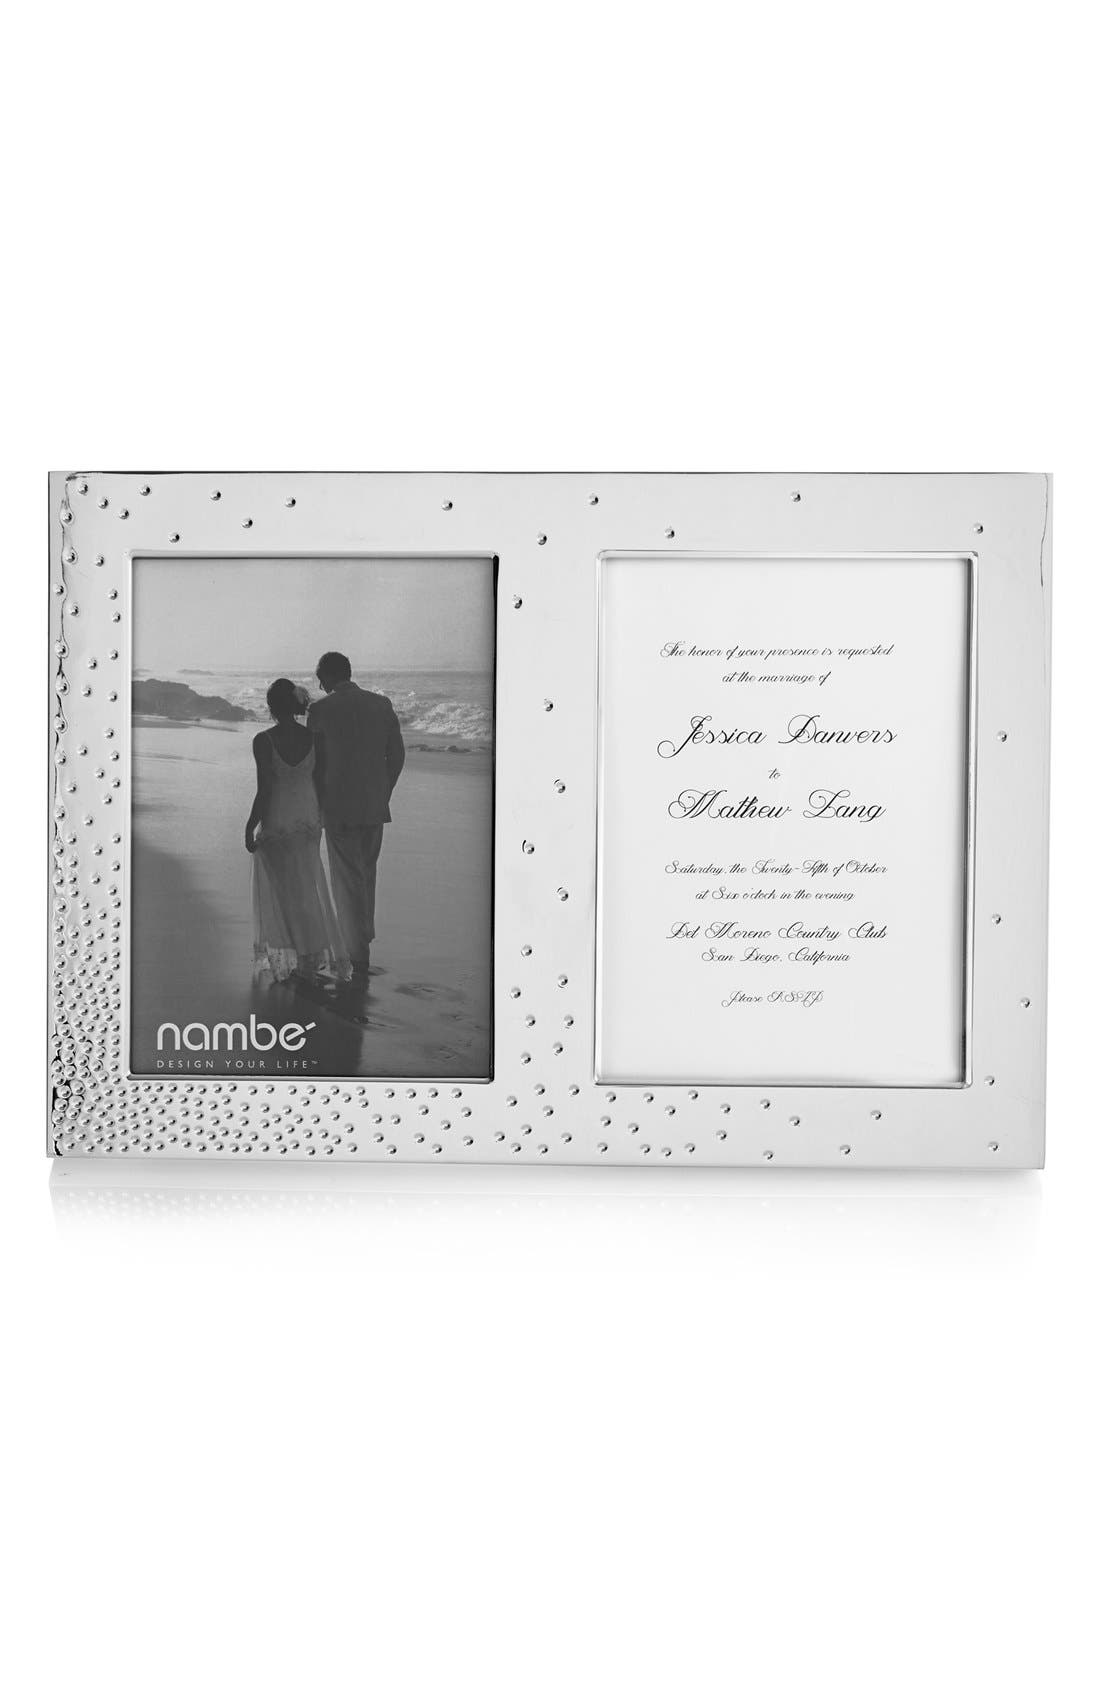 Alternate Image 1 Selected - Nambé Dazzle - Double Invitation Picture Frame